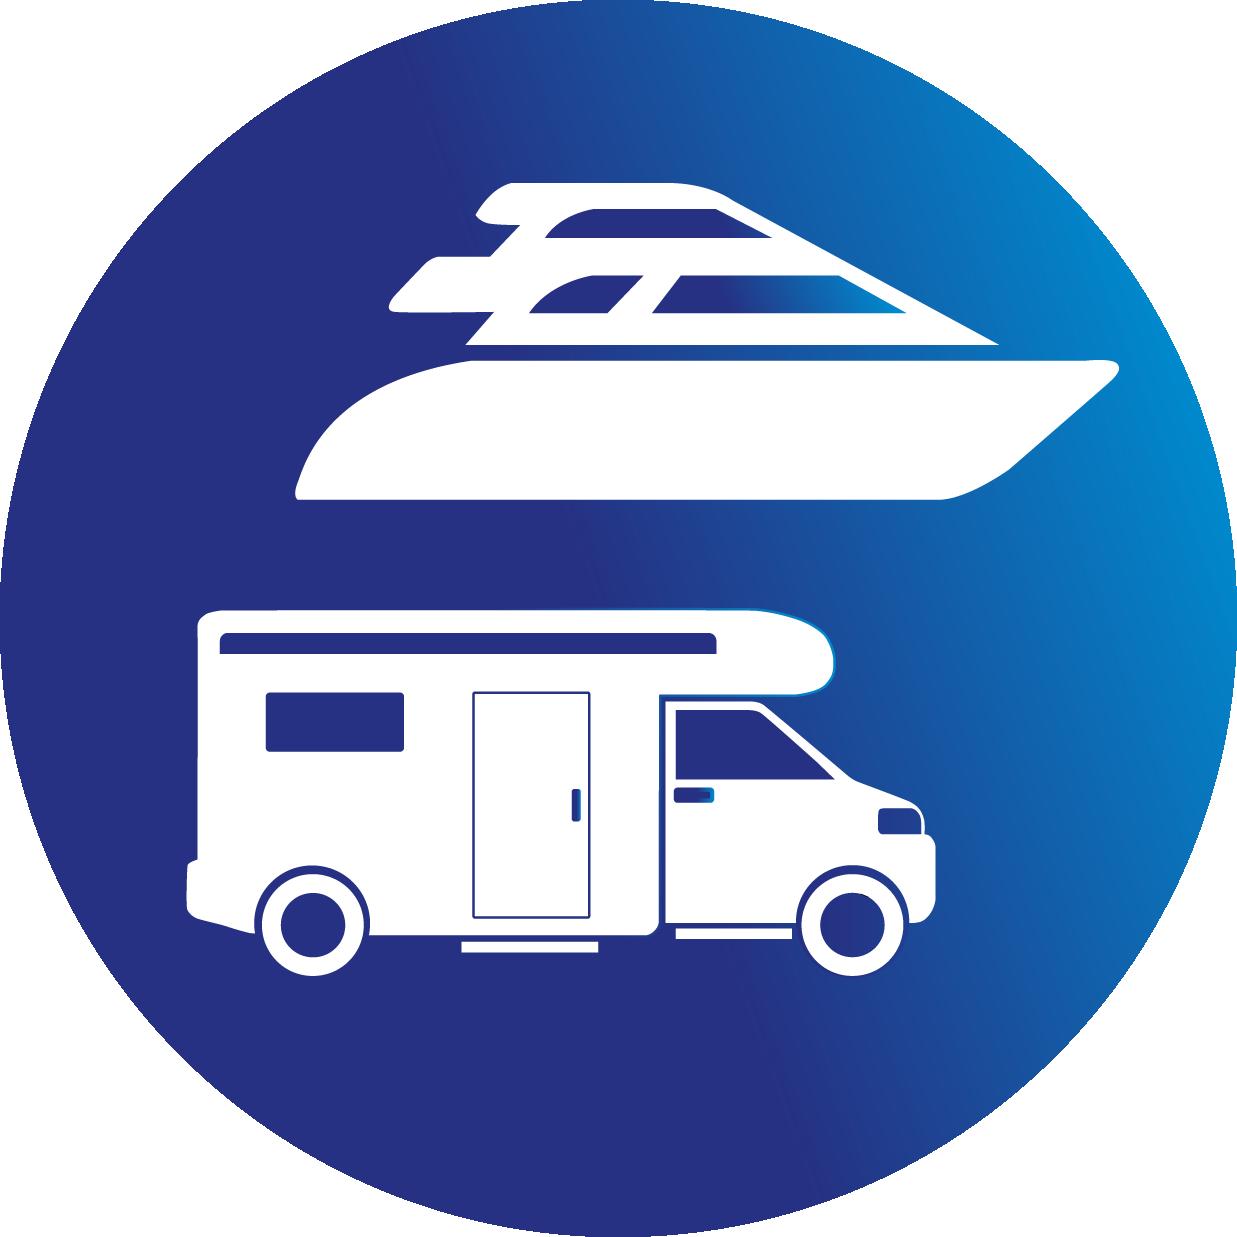 marine-boat-yacht-leisure-camping-car-caravan-battery